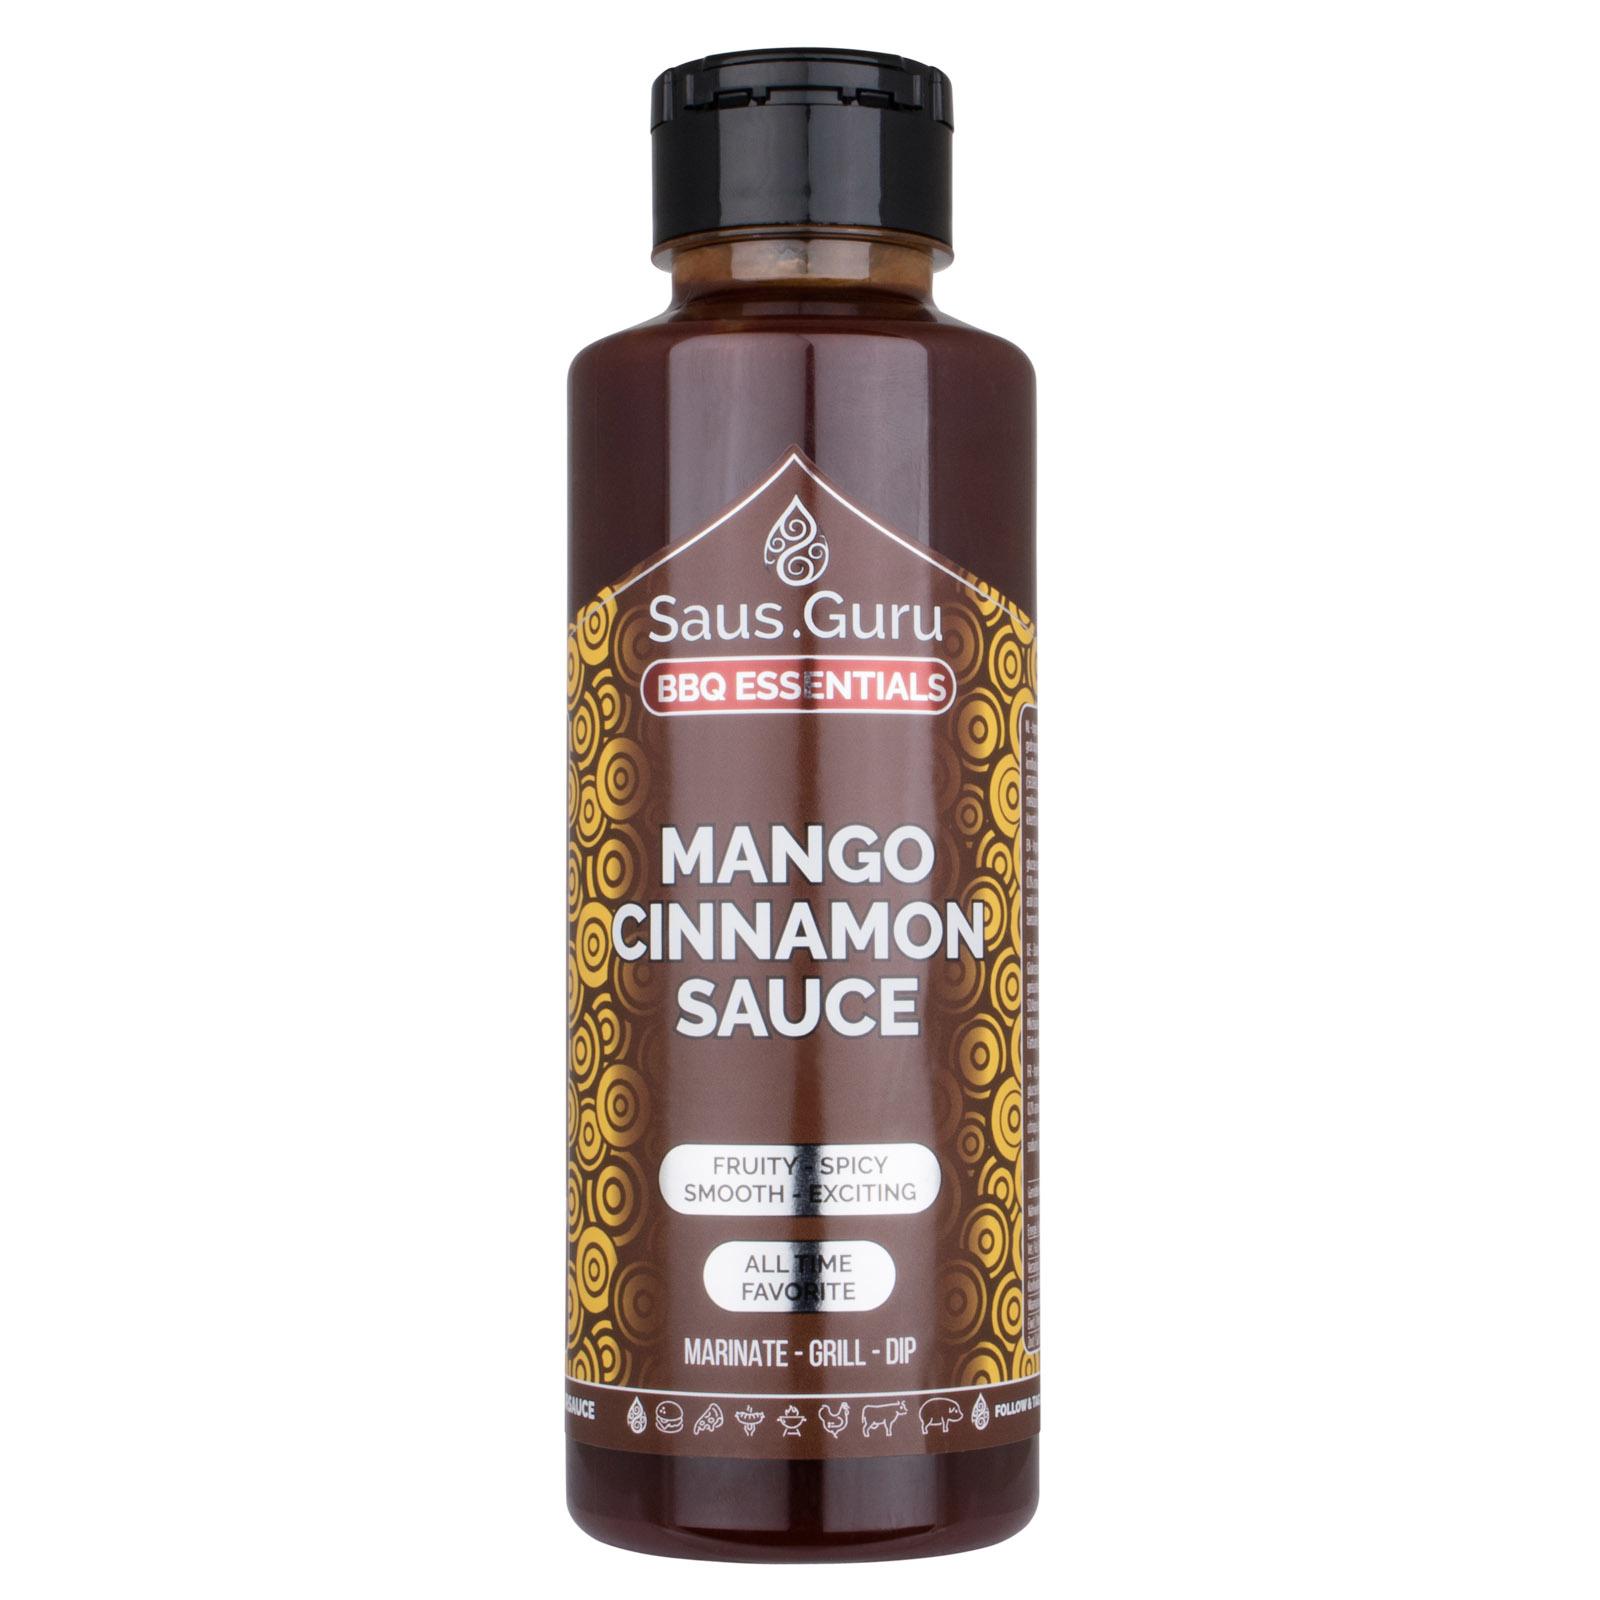 Saus.Guru's Mango Cinnamon BBQ Sauce-2